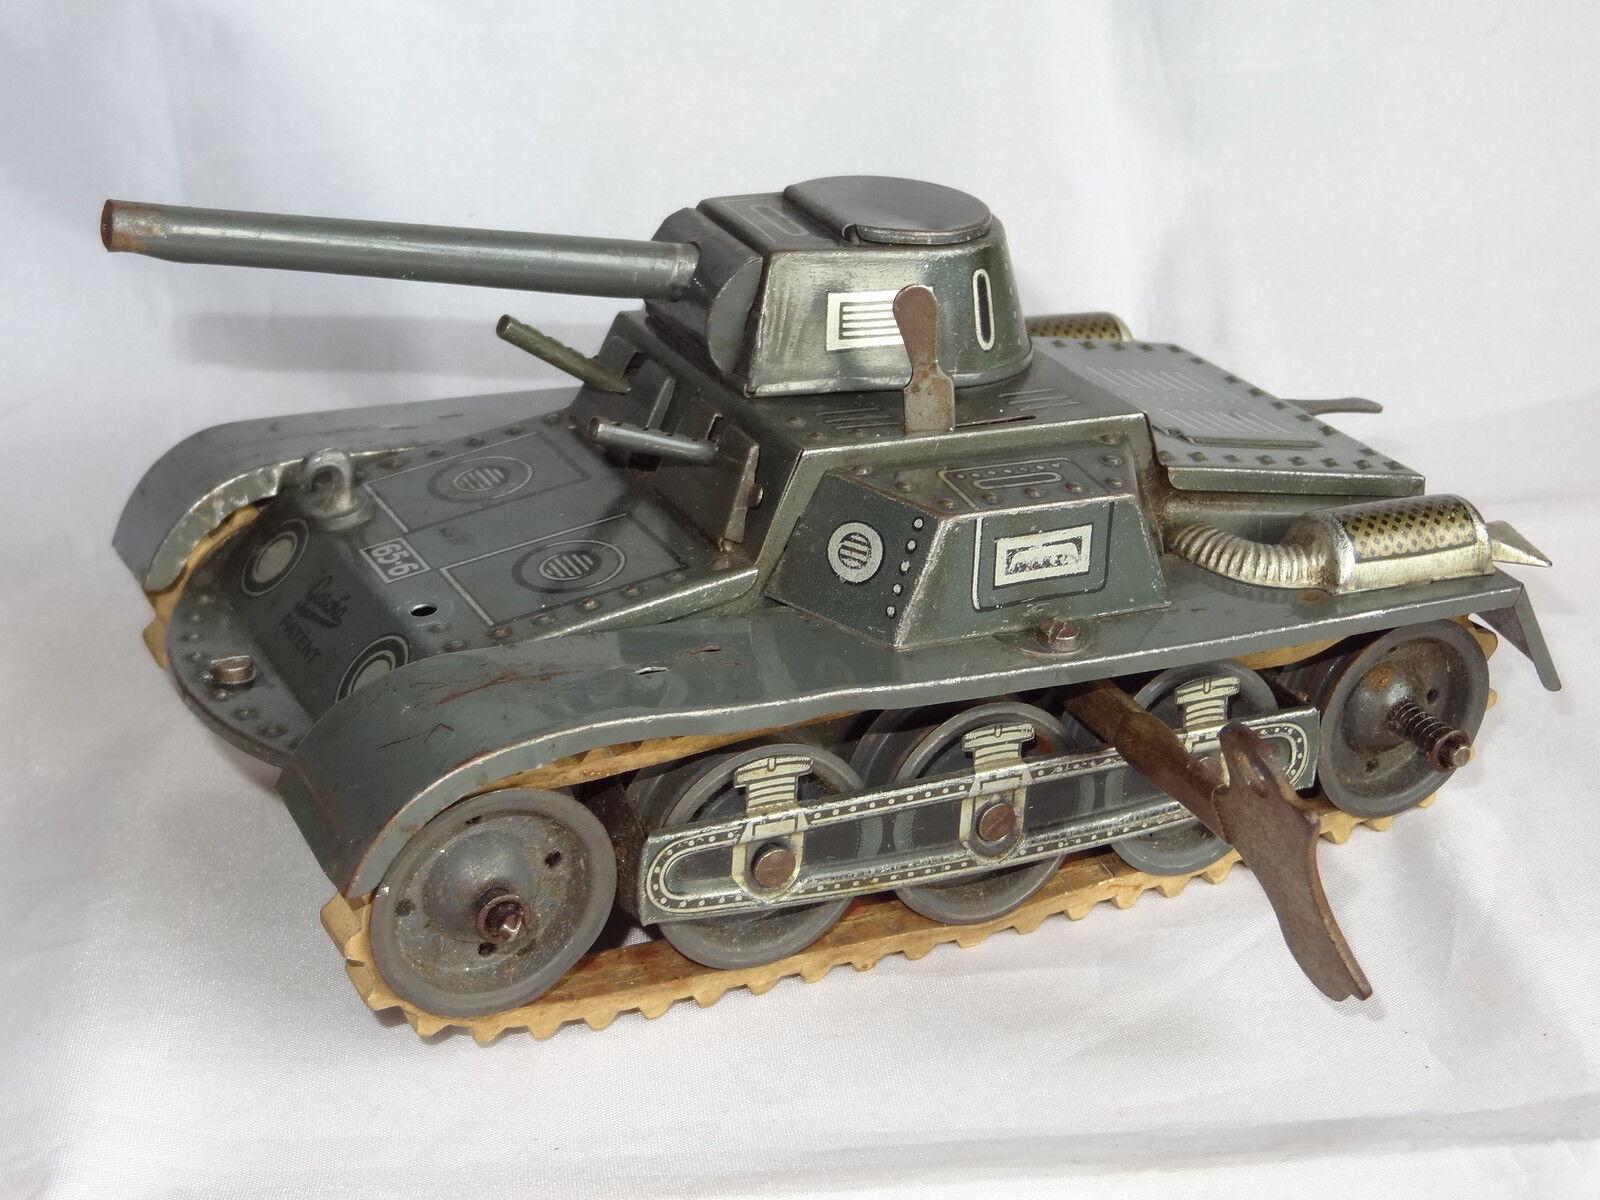 Gescha West Germany Panzer tanque Hojalata Cuerda C1'S